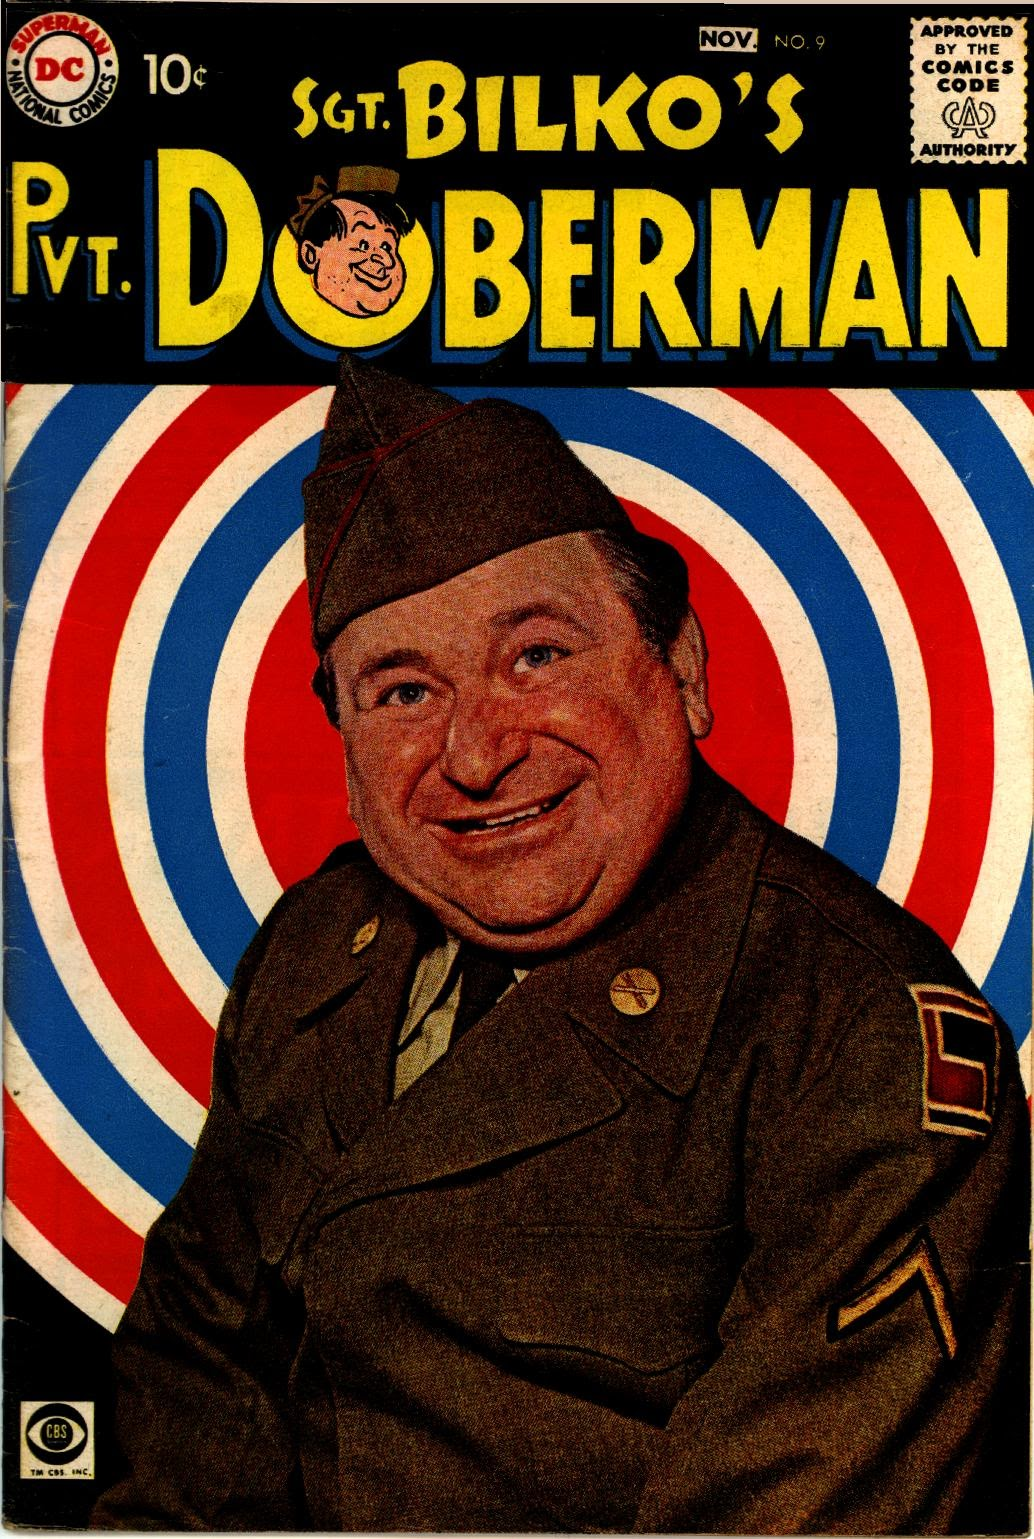 Sgt. Bilkos Pvt. Doberman 9 Page 1